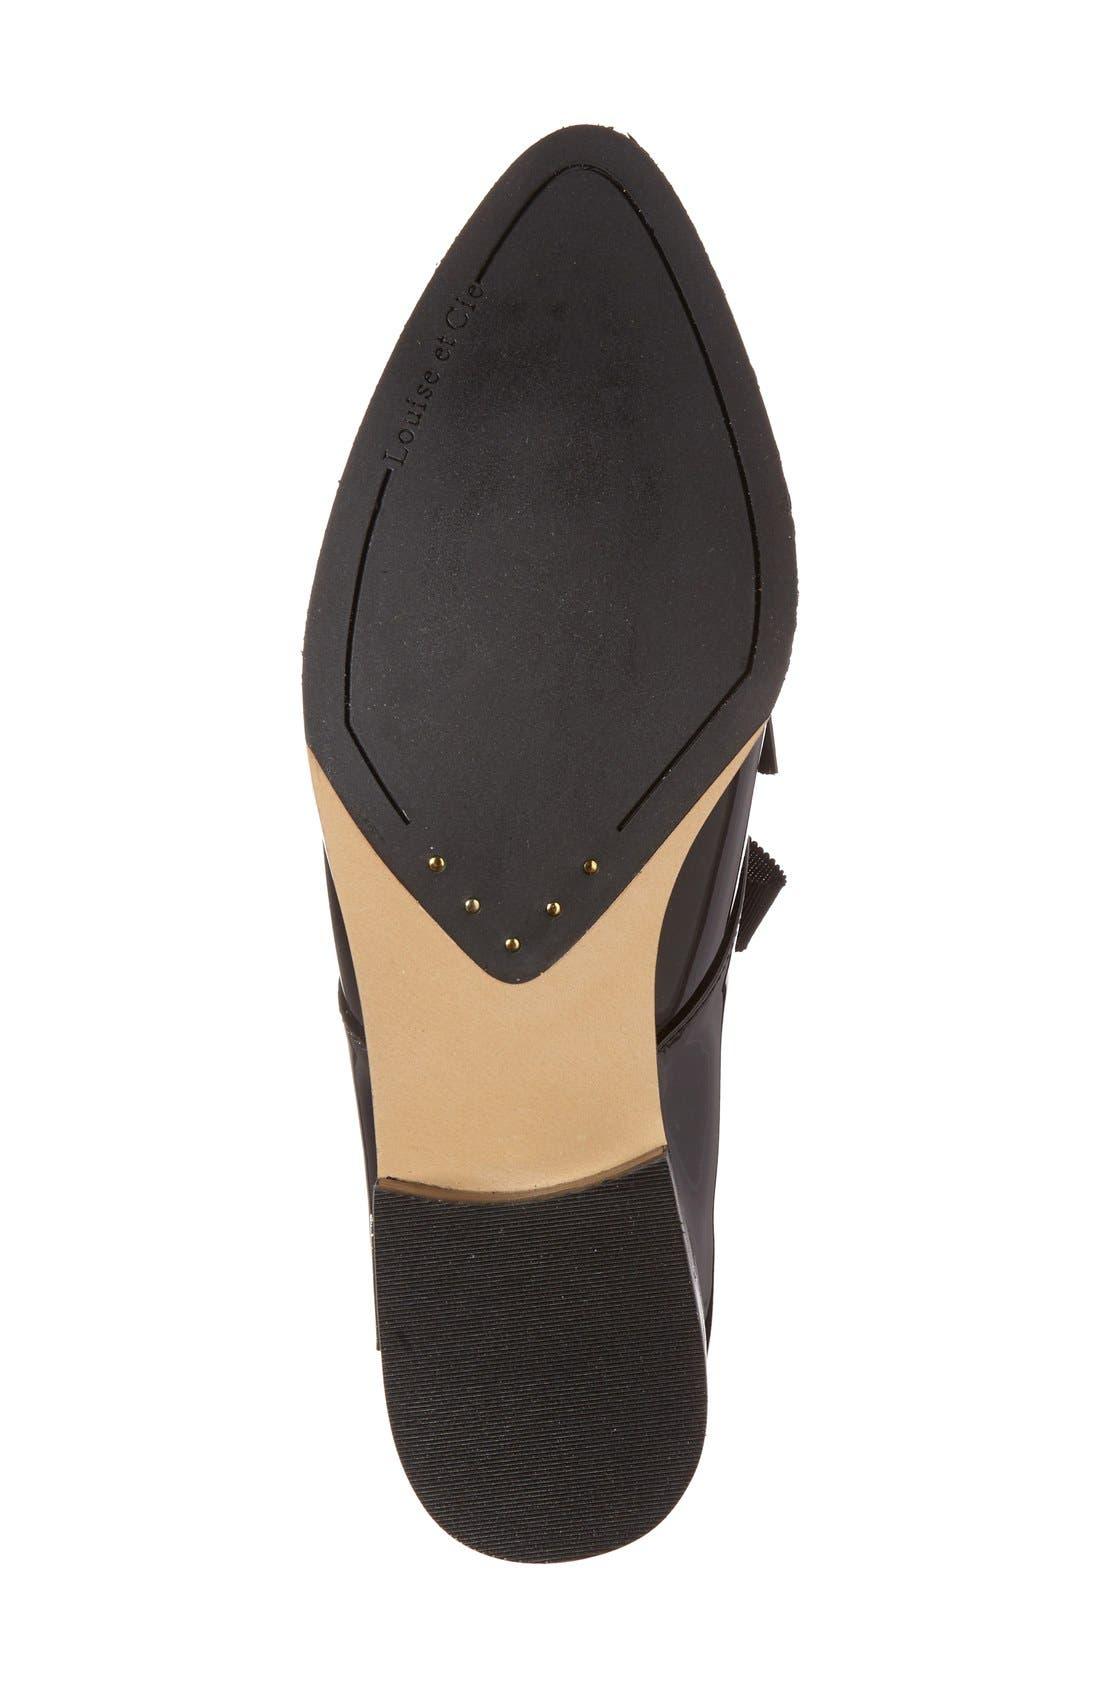 'Adwin' Almond Toe Oxford,                             Alternate thumbnail 4, color,                             Black Patent